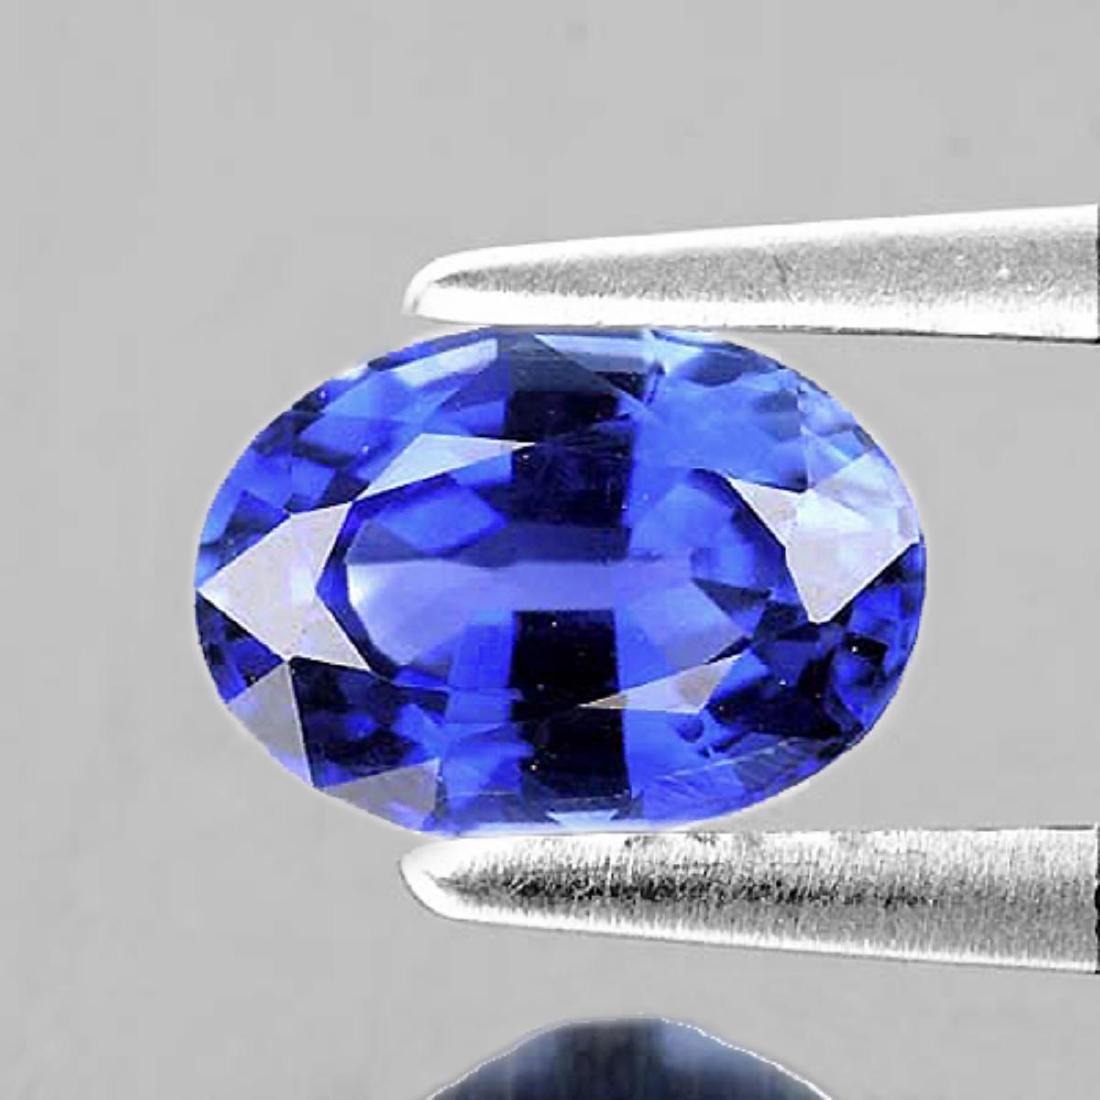 Natural Purplish Blue Sapphire 6x4 MM - Flawless